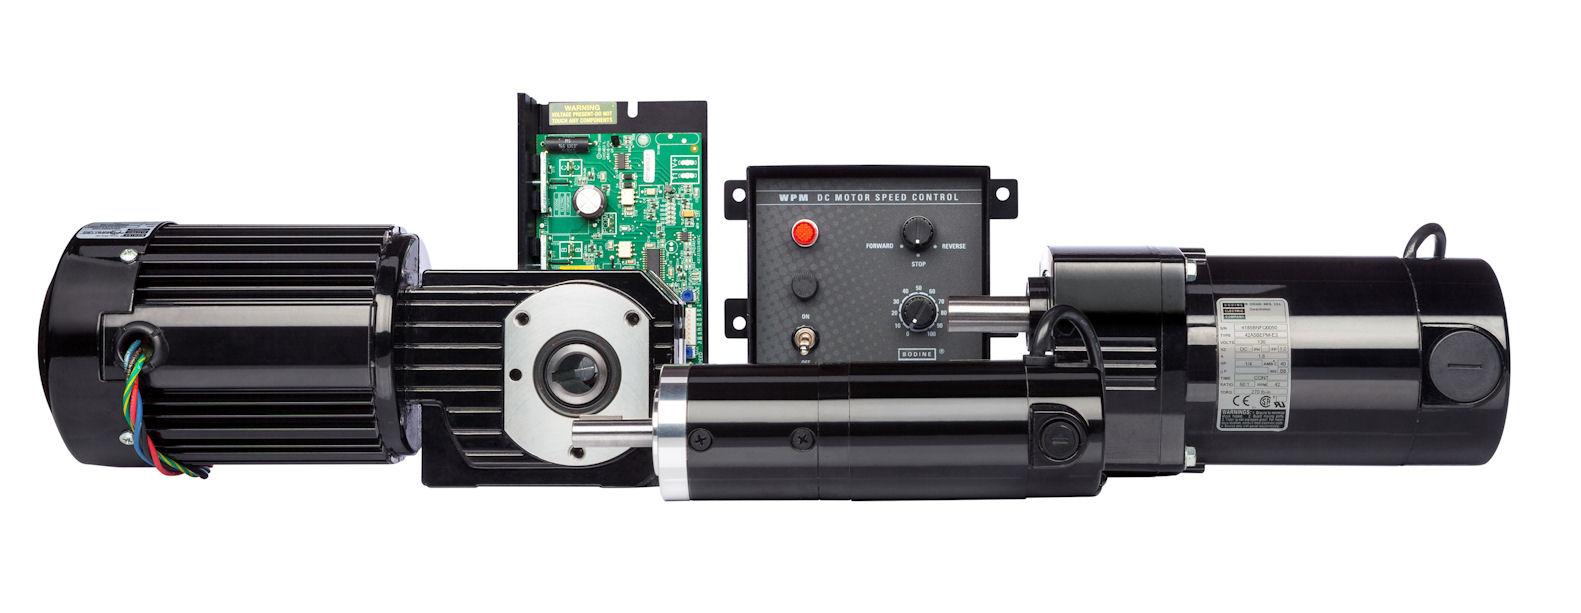 Bodine Gear Motor Vdc Gearmotor 32x5bepm W2 Dc Ac Dayton Electric Wiring Diagram Am A Cutler Hammer Db1 Gearmotors And Speed Controls